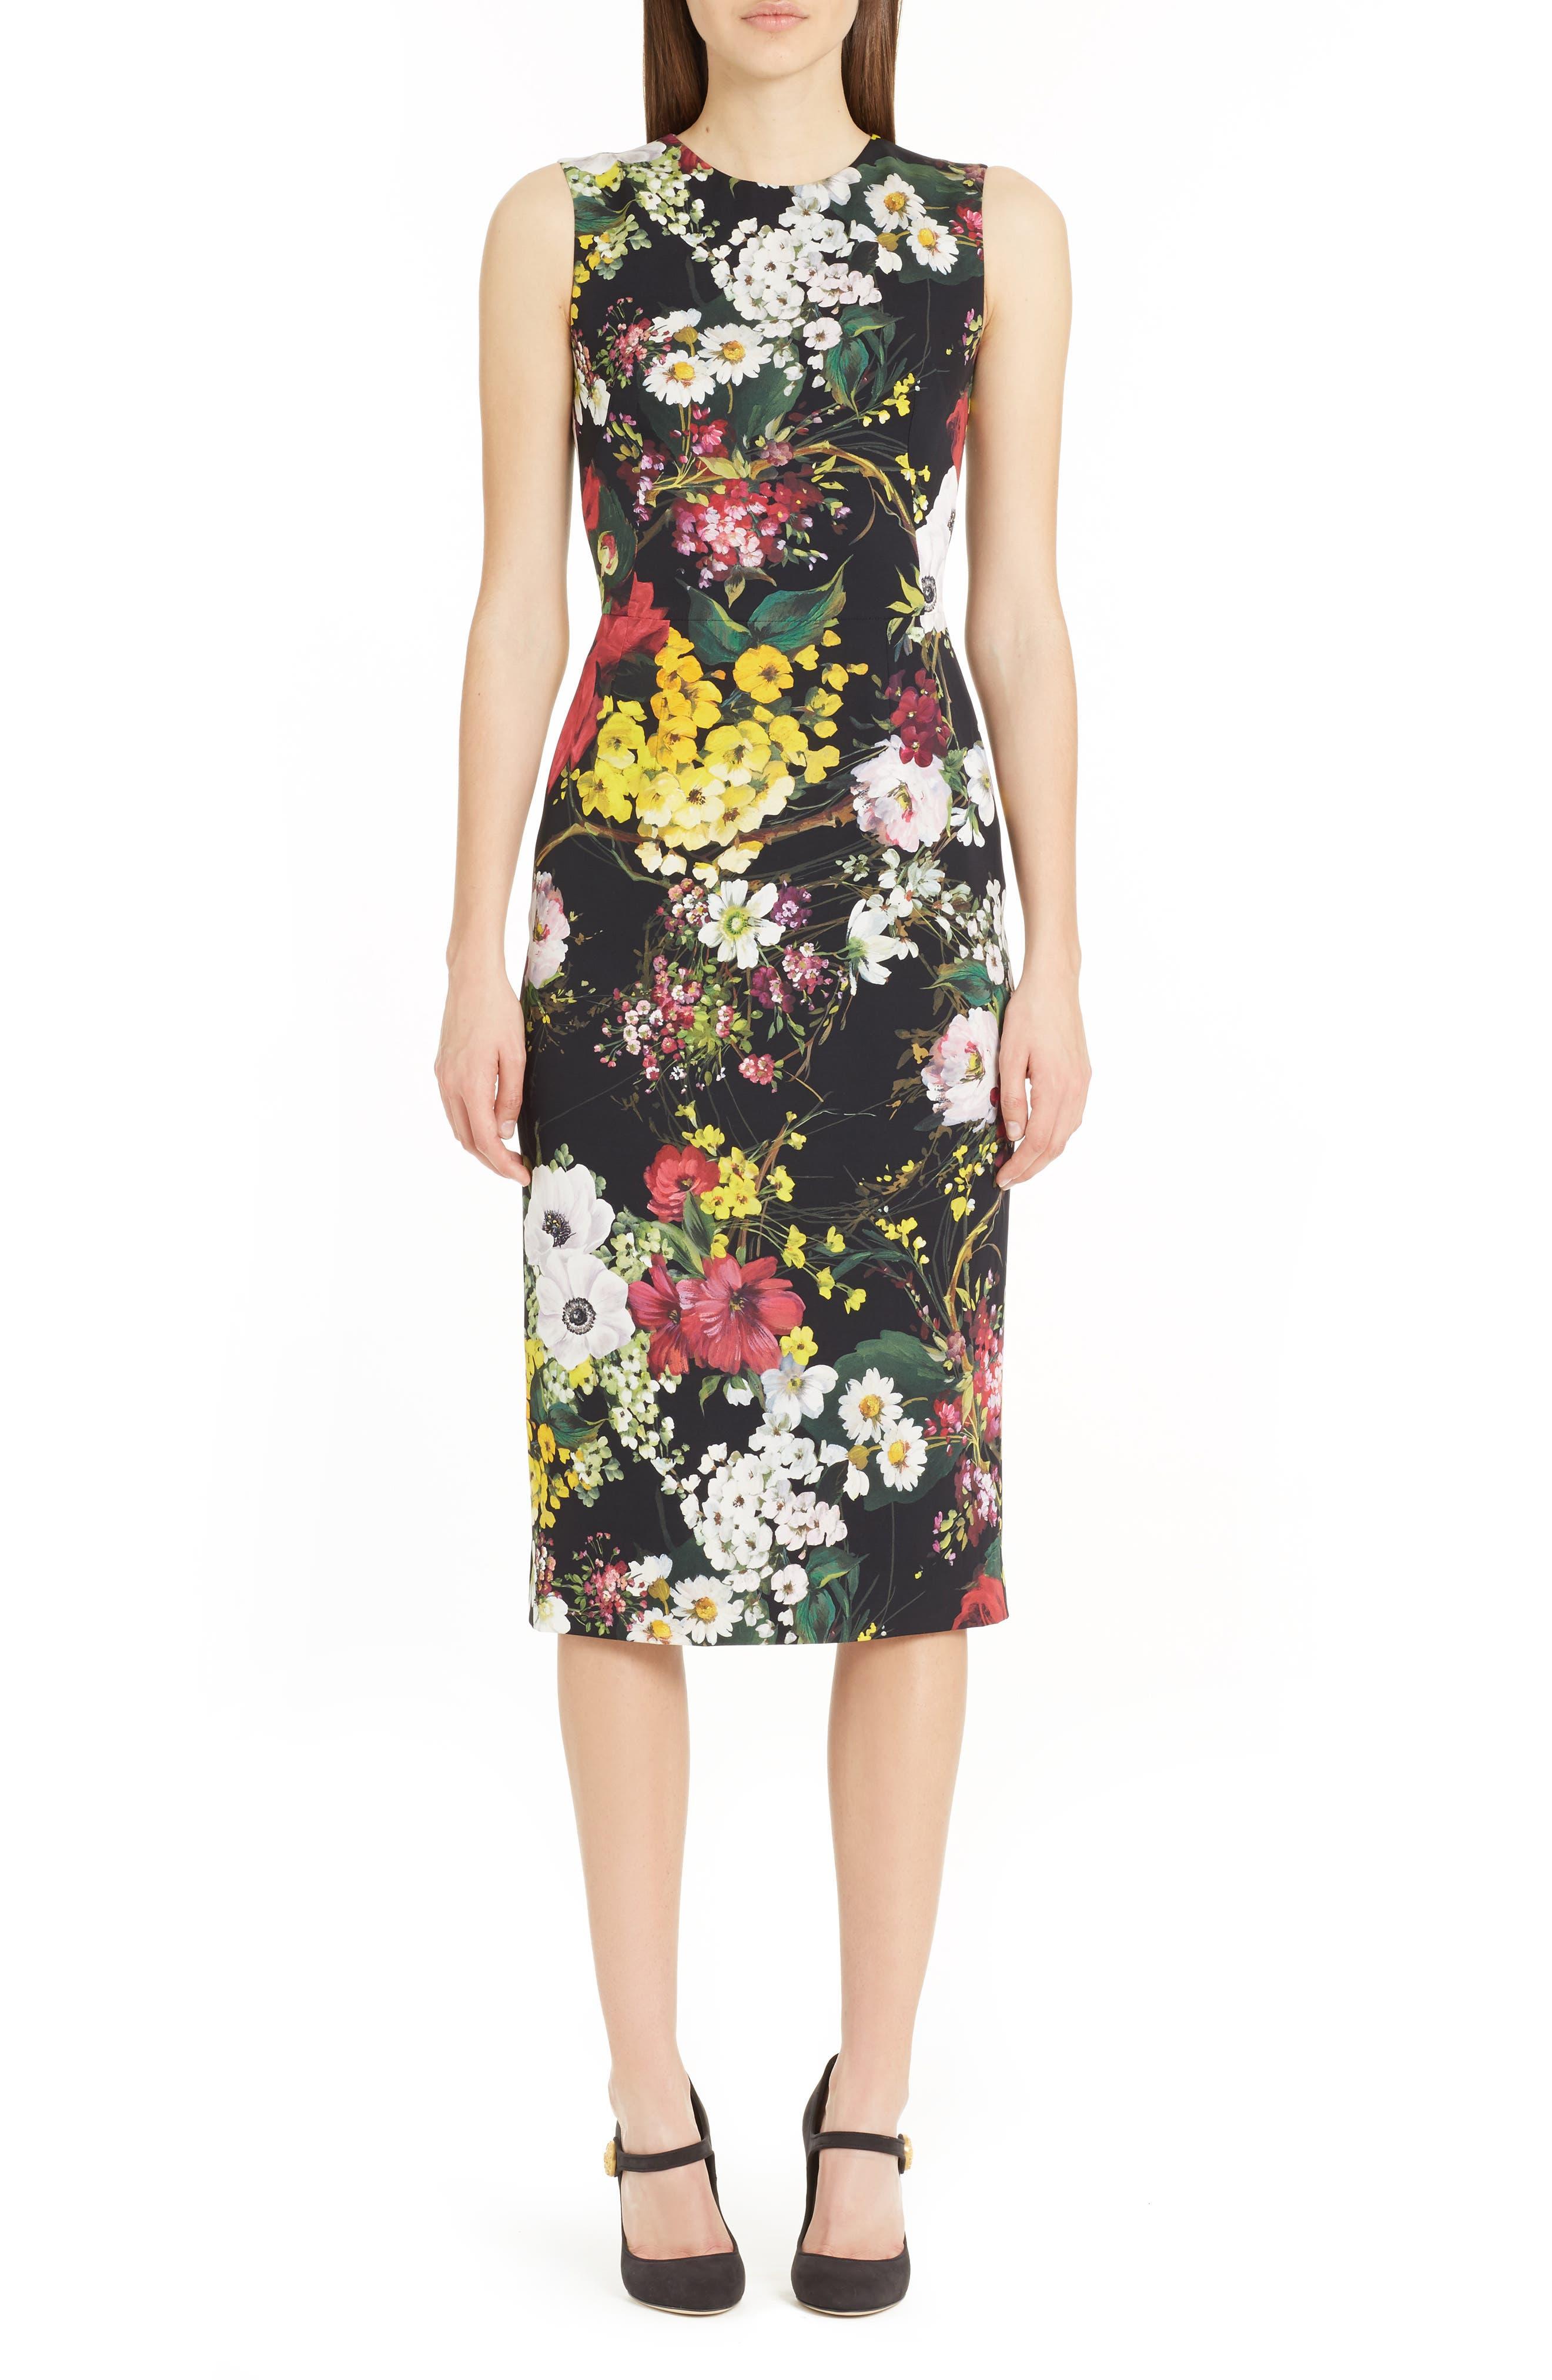 Dolce&Gabbana Floral Print Stretch Silk Sheath Dress